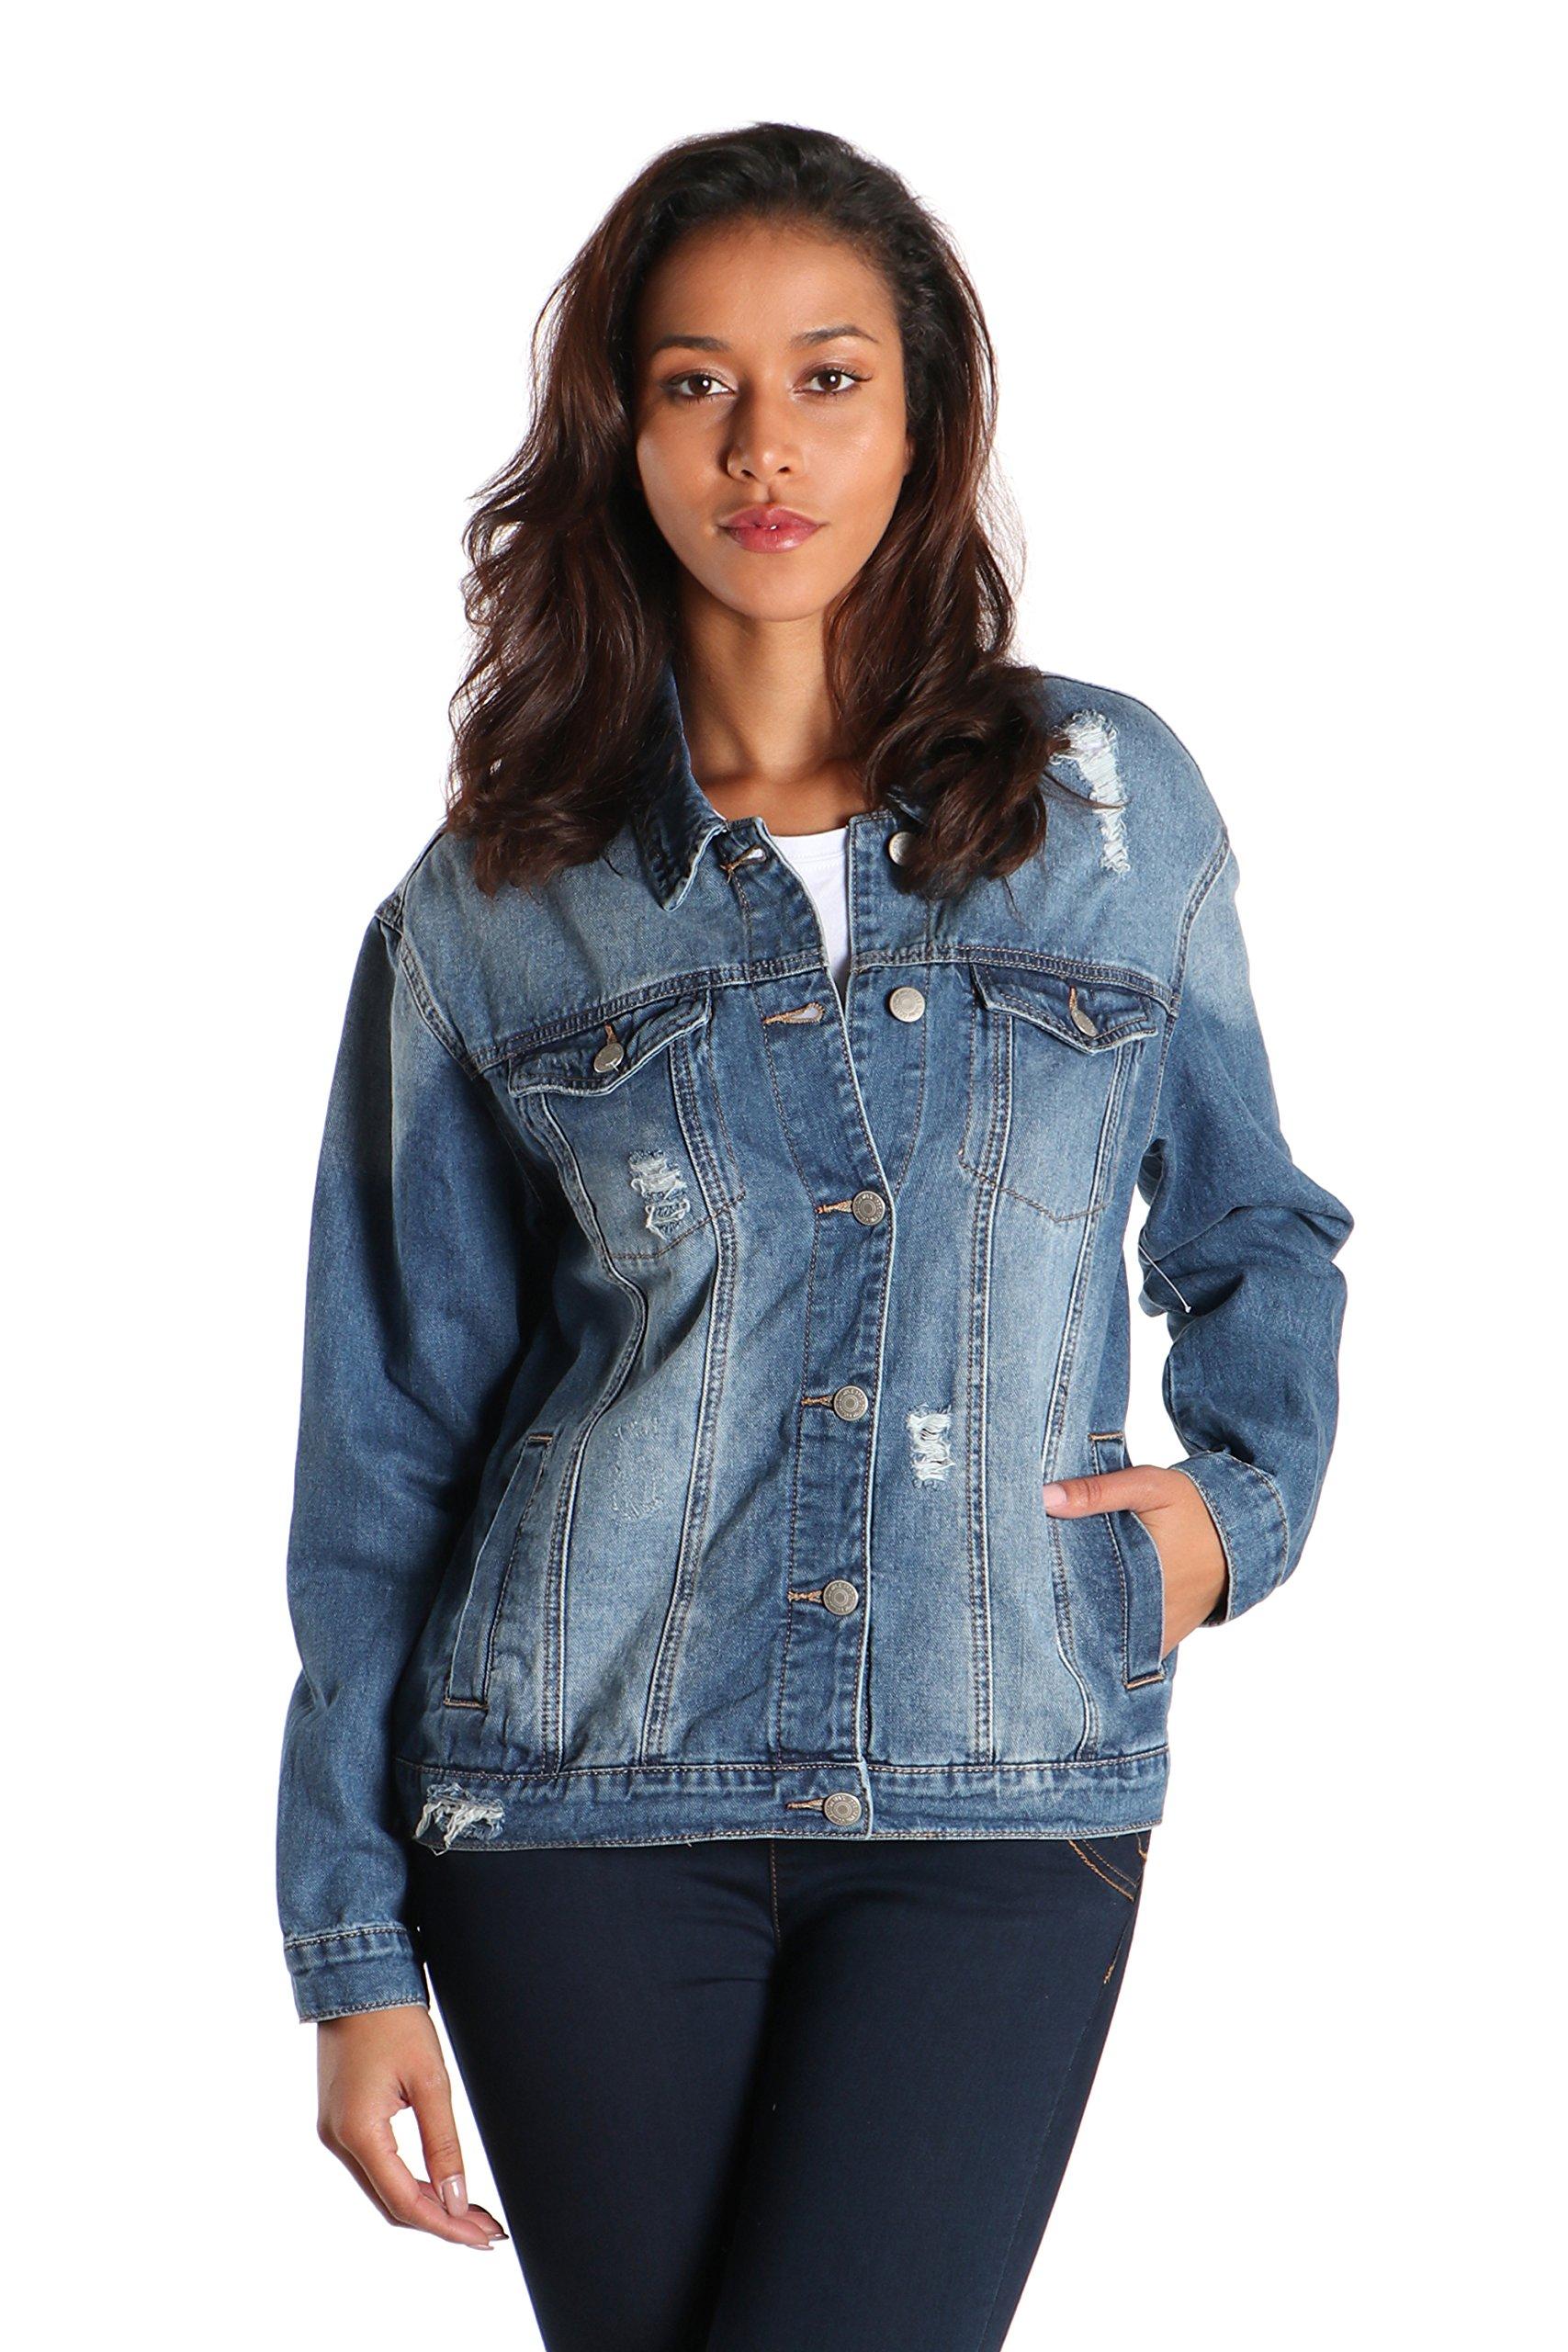 SWTD Womens Classic Style Vintage Destroyed Accent Button Down Denim Trucker Jackets (Large, Medium DENIM-90091)